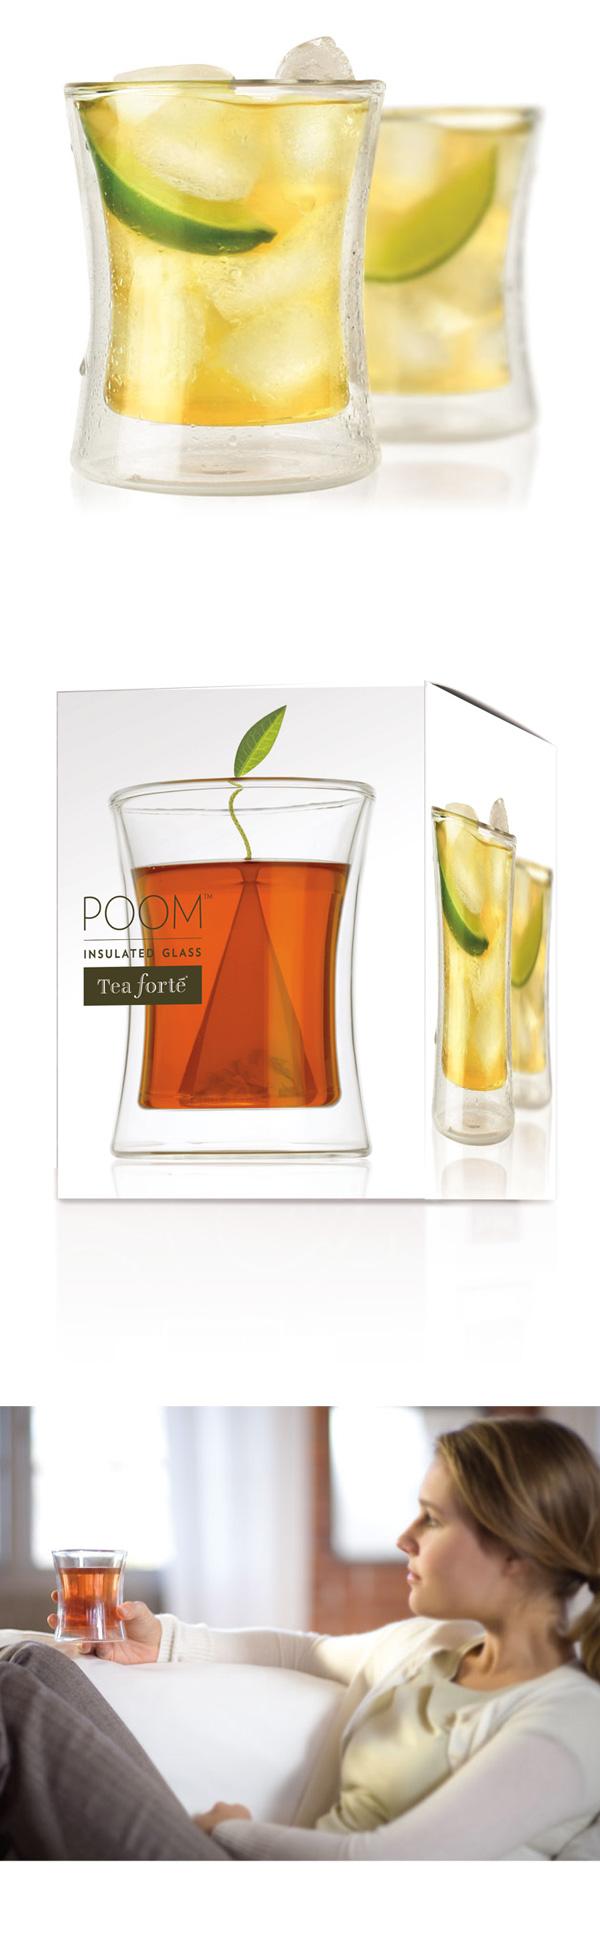 Tea Forte 雙層隔熱玻璃杯